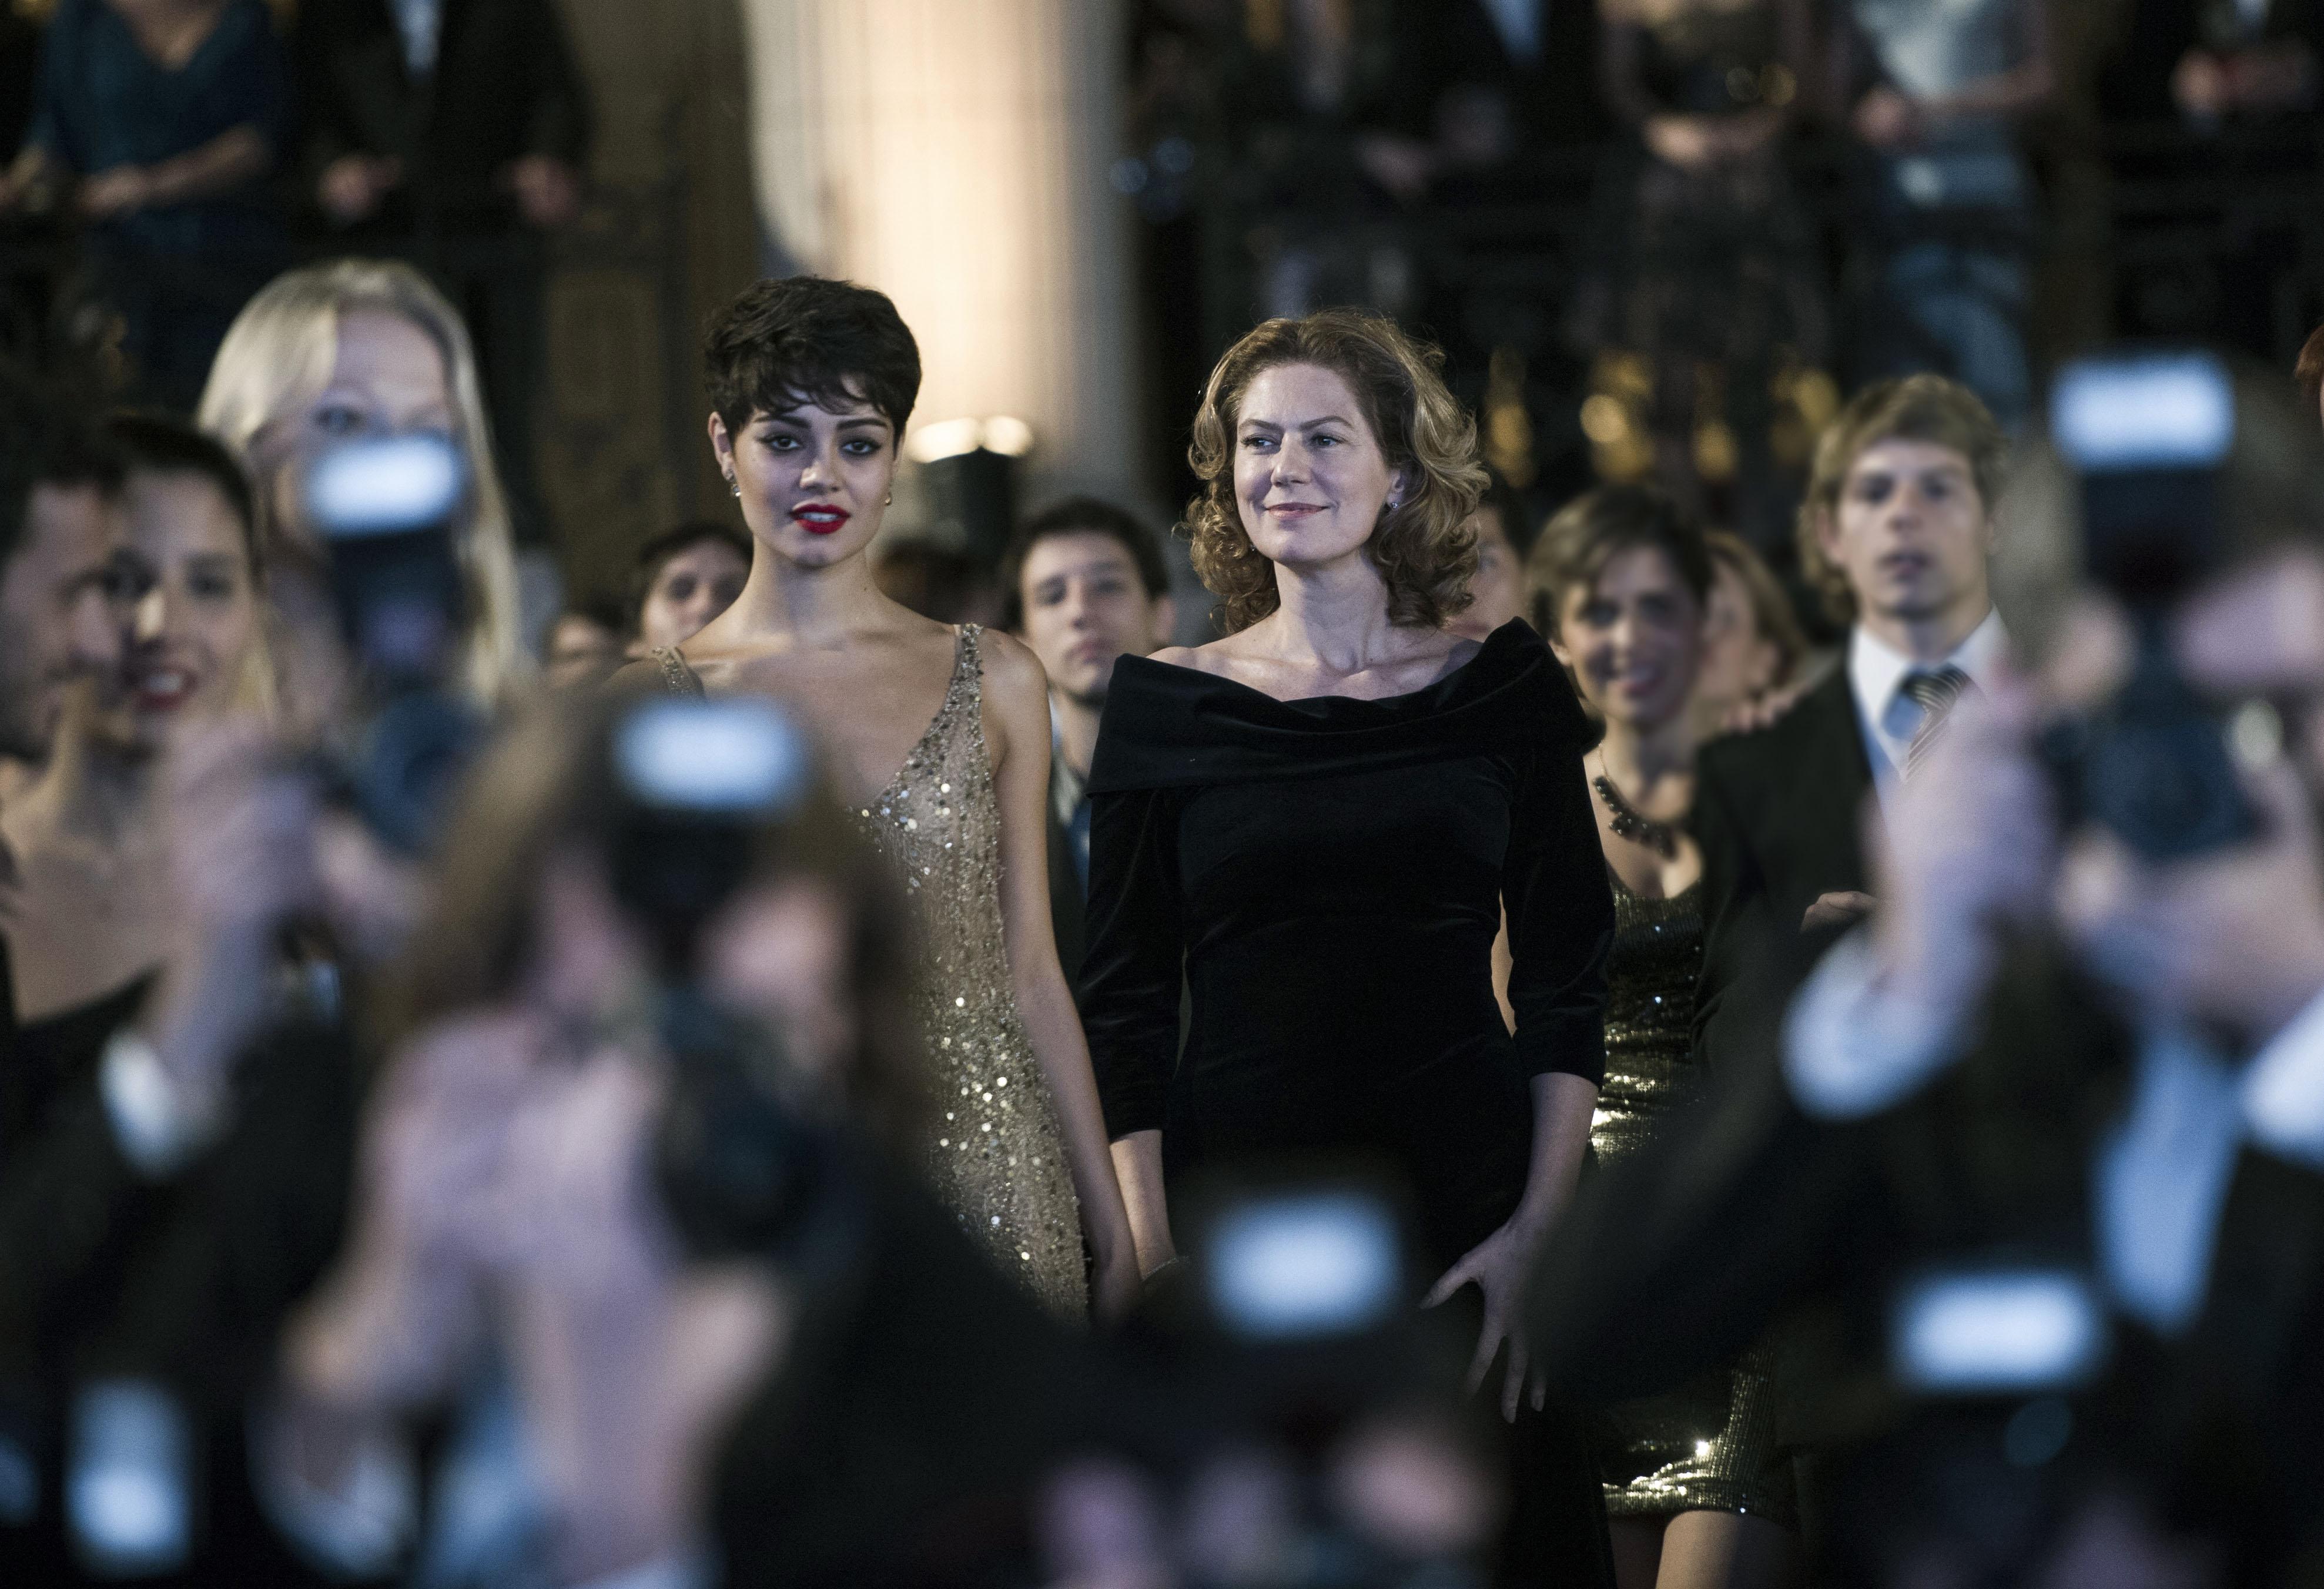 Sophie Charlotte e Patricia Pillar em cena. Crédito: Globo/Estevam Avellar